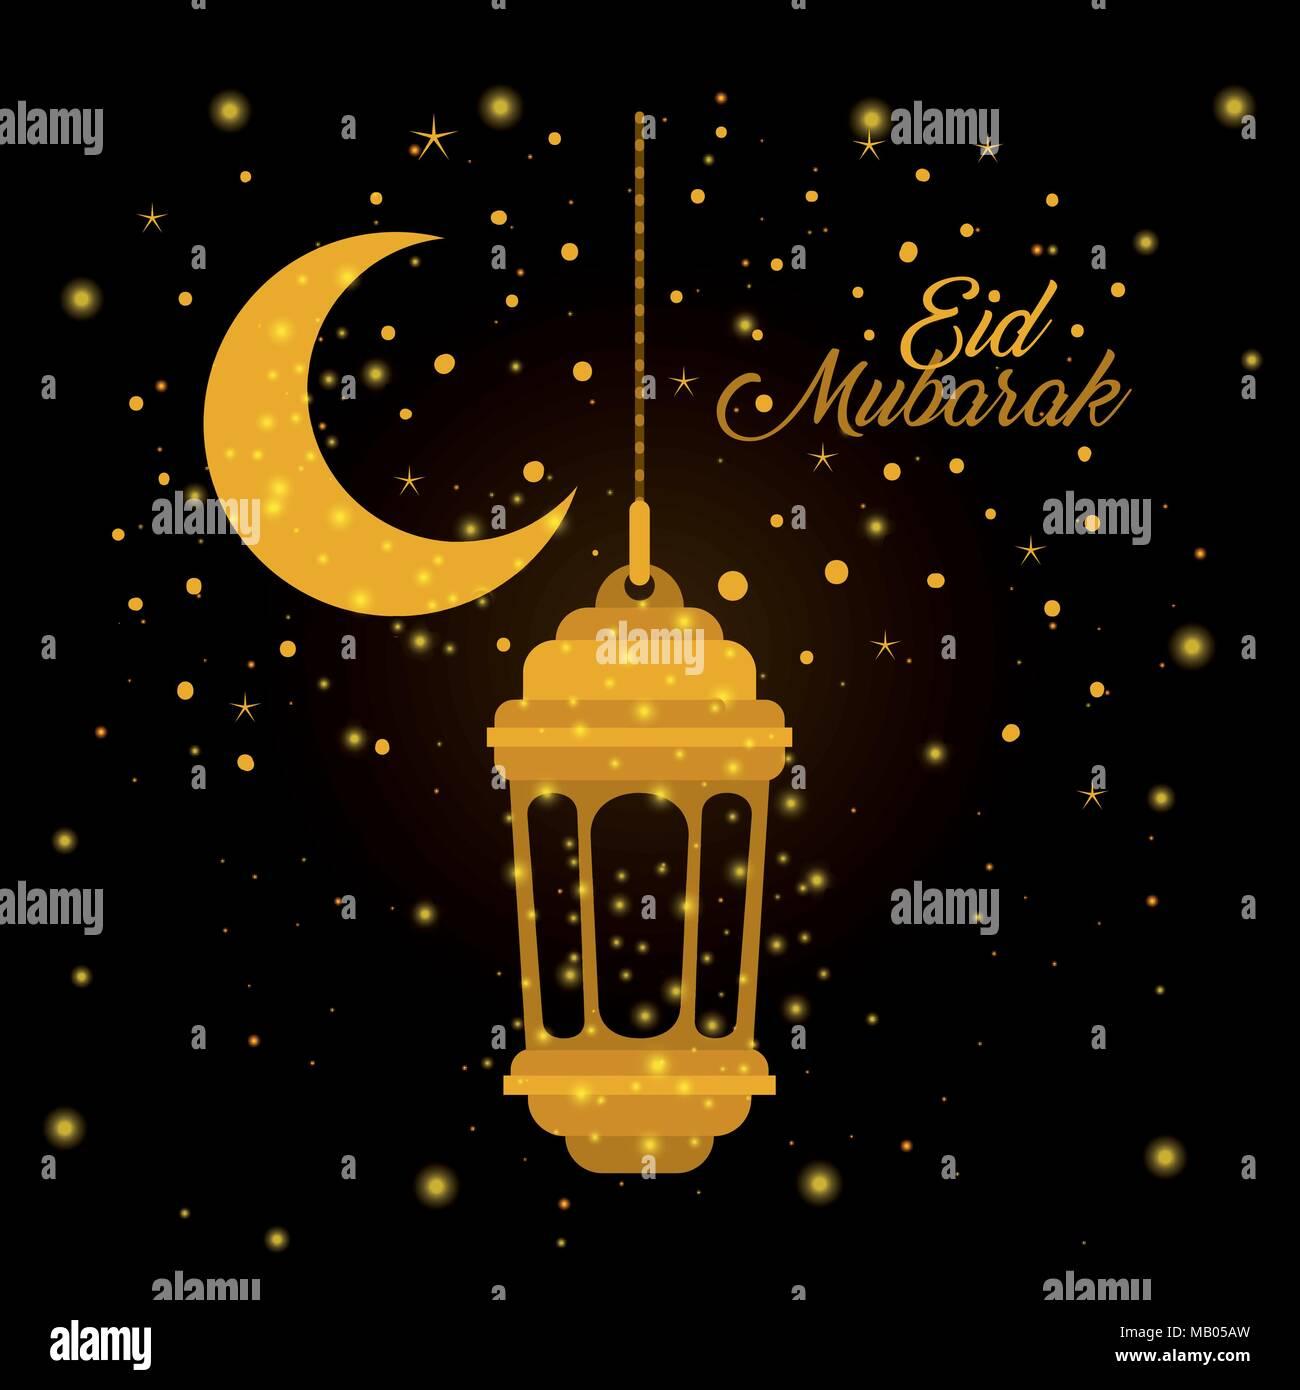 eid mubarak lantern with moon and stars - Stock Image